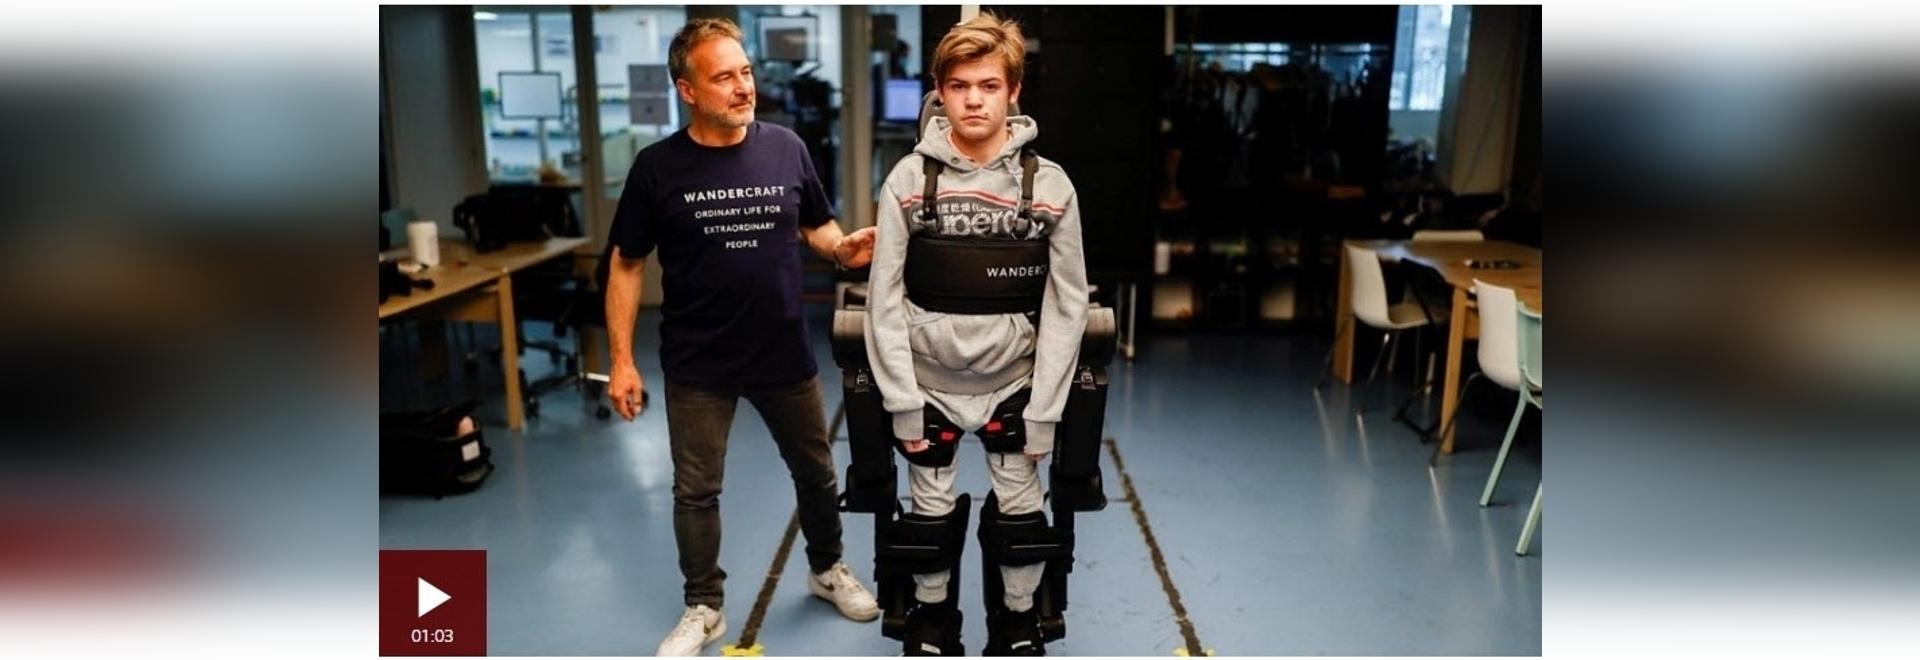 Dad builds robotic exoskeleton to help son walk